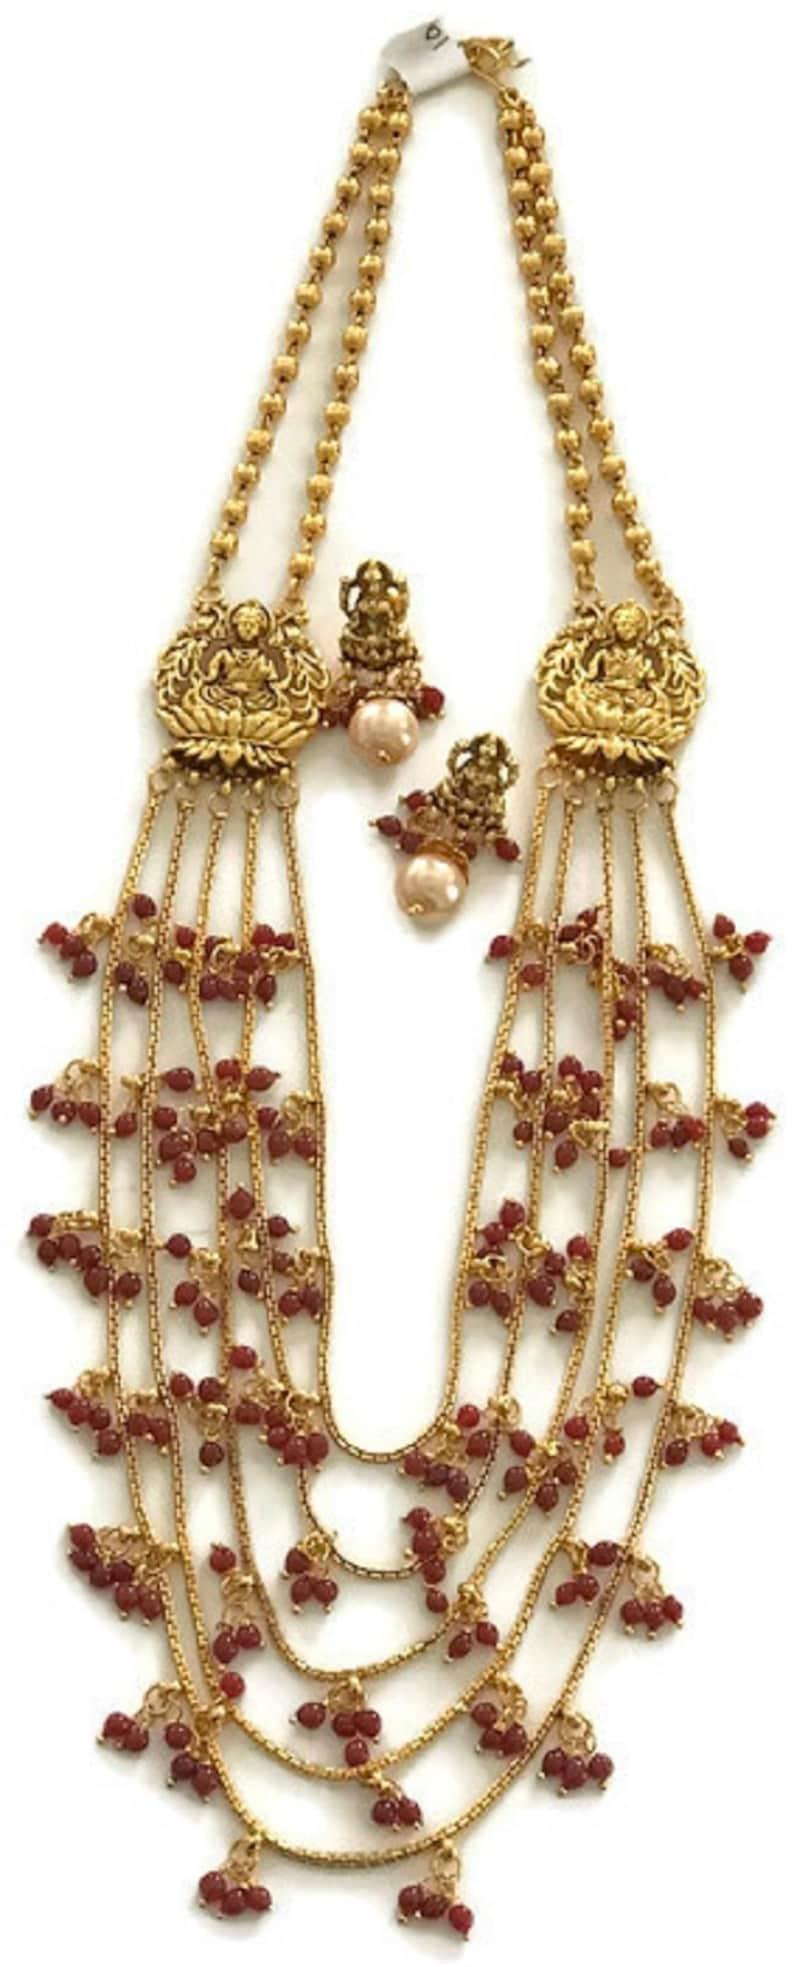 Na n016  New Bollywood Designer 24 Inches Golden Balls Lakshmi Ji Pendants /& Multicolor Beads Necklace Pendant Earring Set Indian Jewelry.